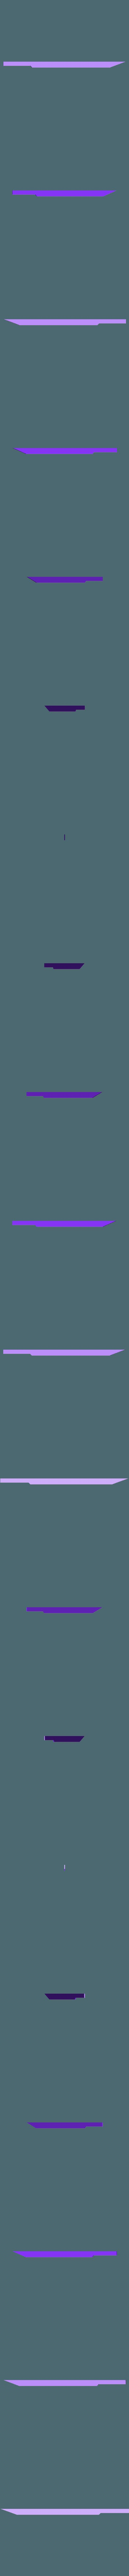 Side_Rear_Fuselage_Keel.stl Download free STL file Flyer Mk. 1 • 3D printing object, billbo1958